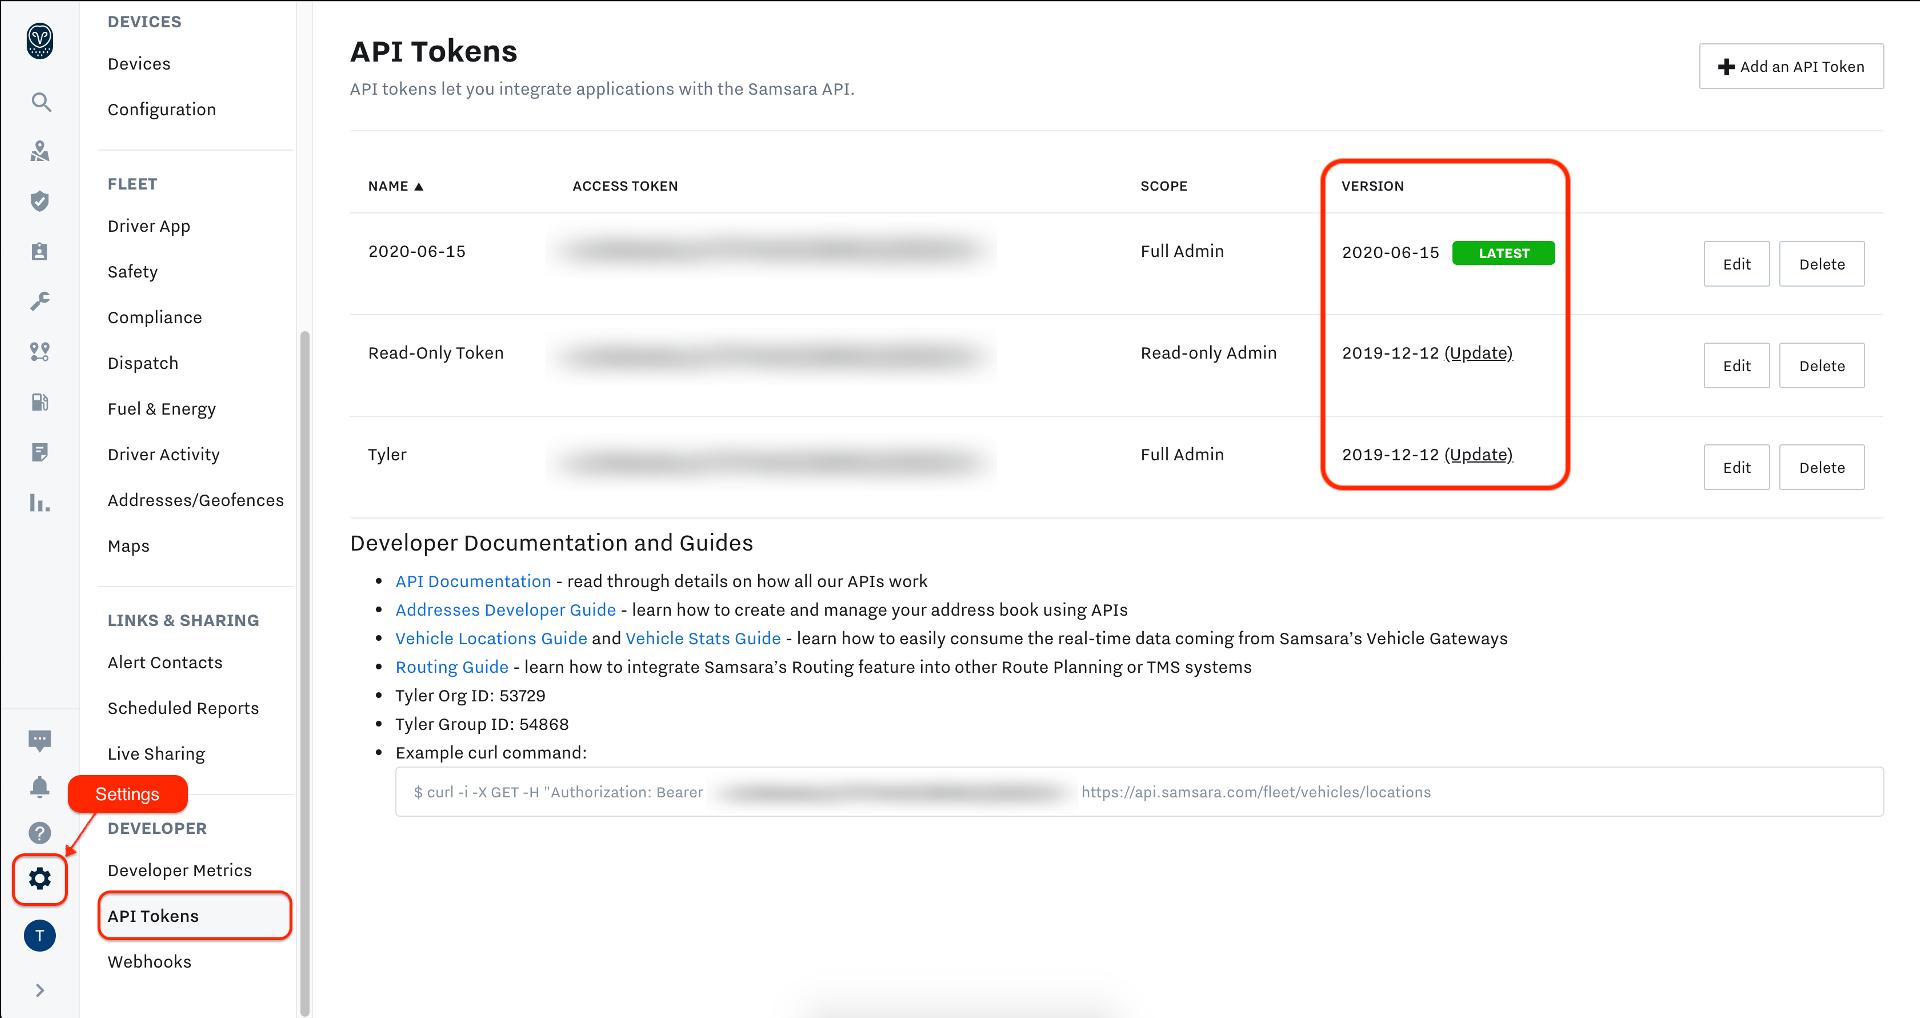 Cloud Dashboard -> Settings -> API Tokens